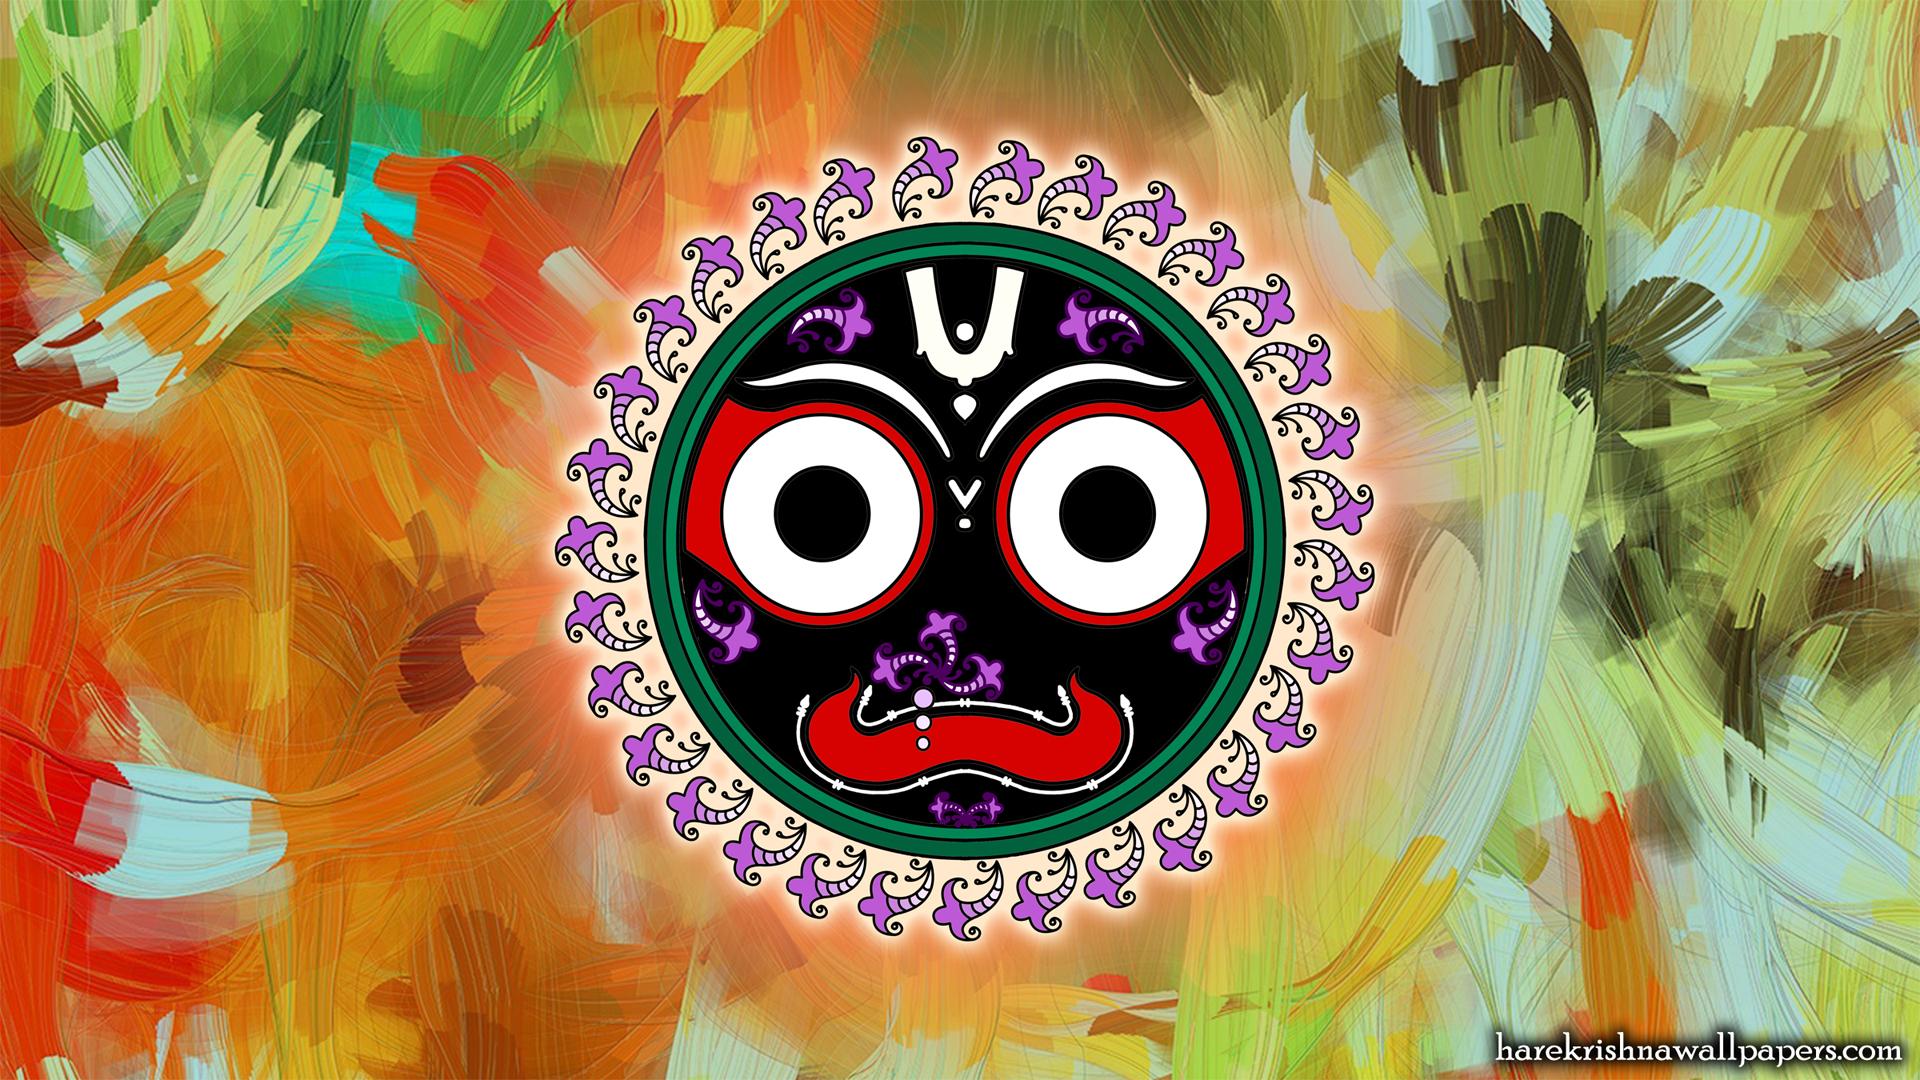 Jai Jagannath Wallpaper (017) Size 1920x1080 Download